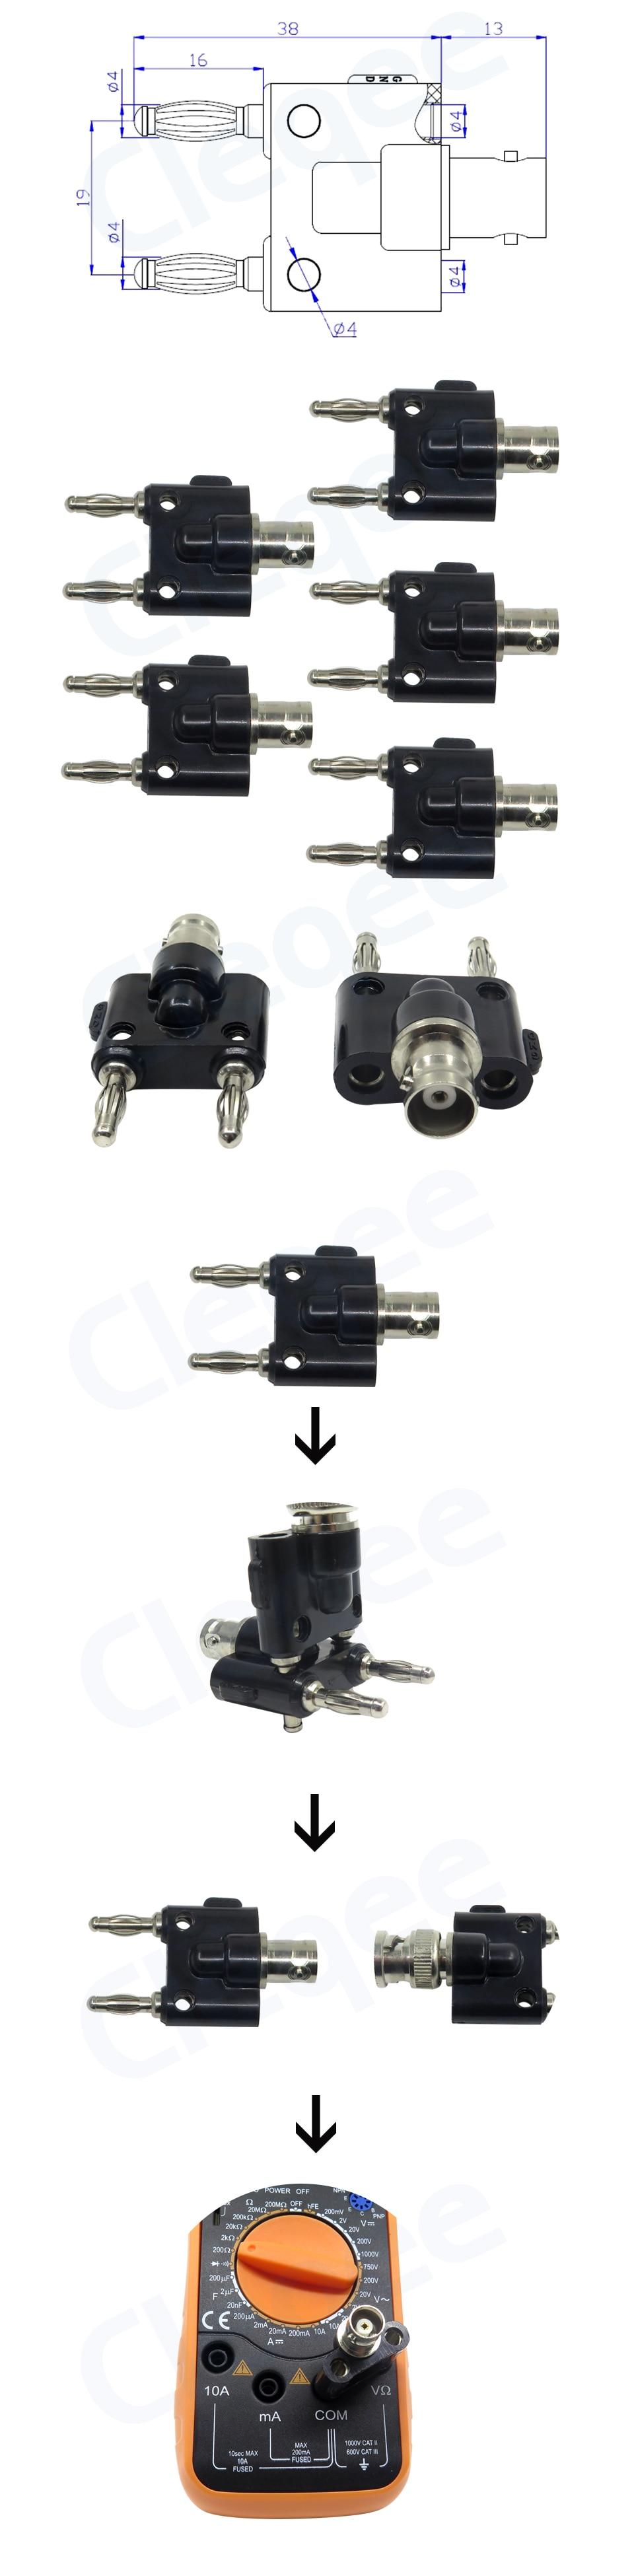 5PCS P7006 BNC Adapter Female Jack Dual Banana Binding Male Connector Wholesale